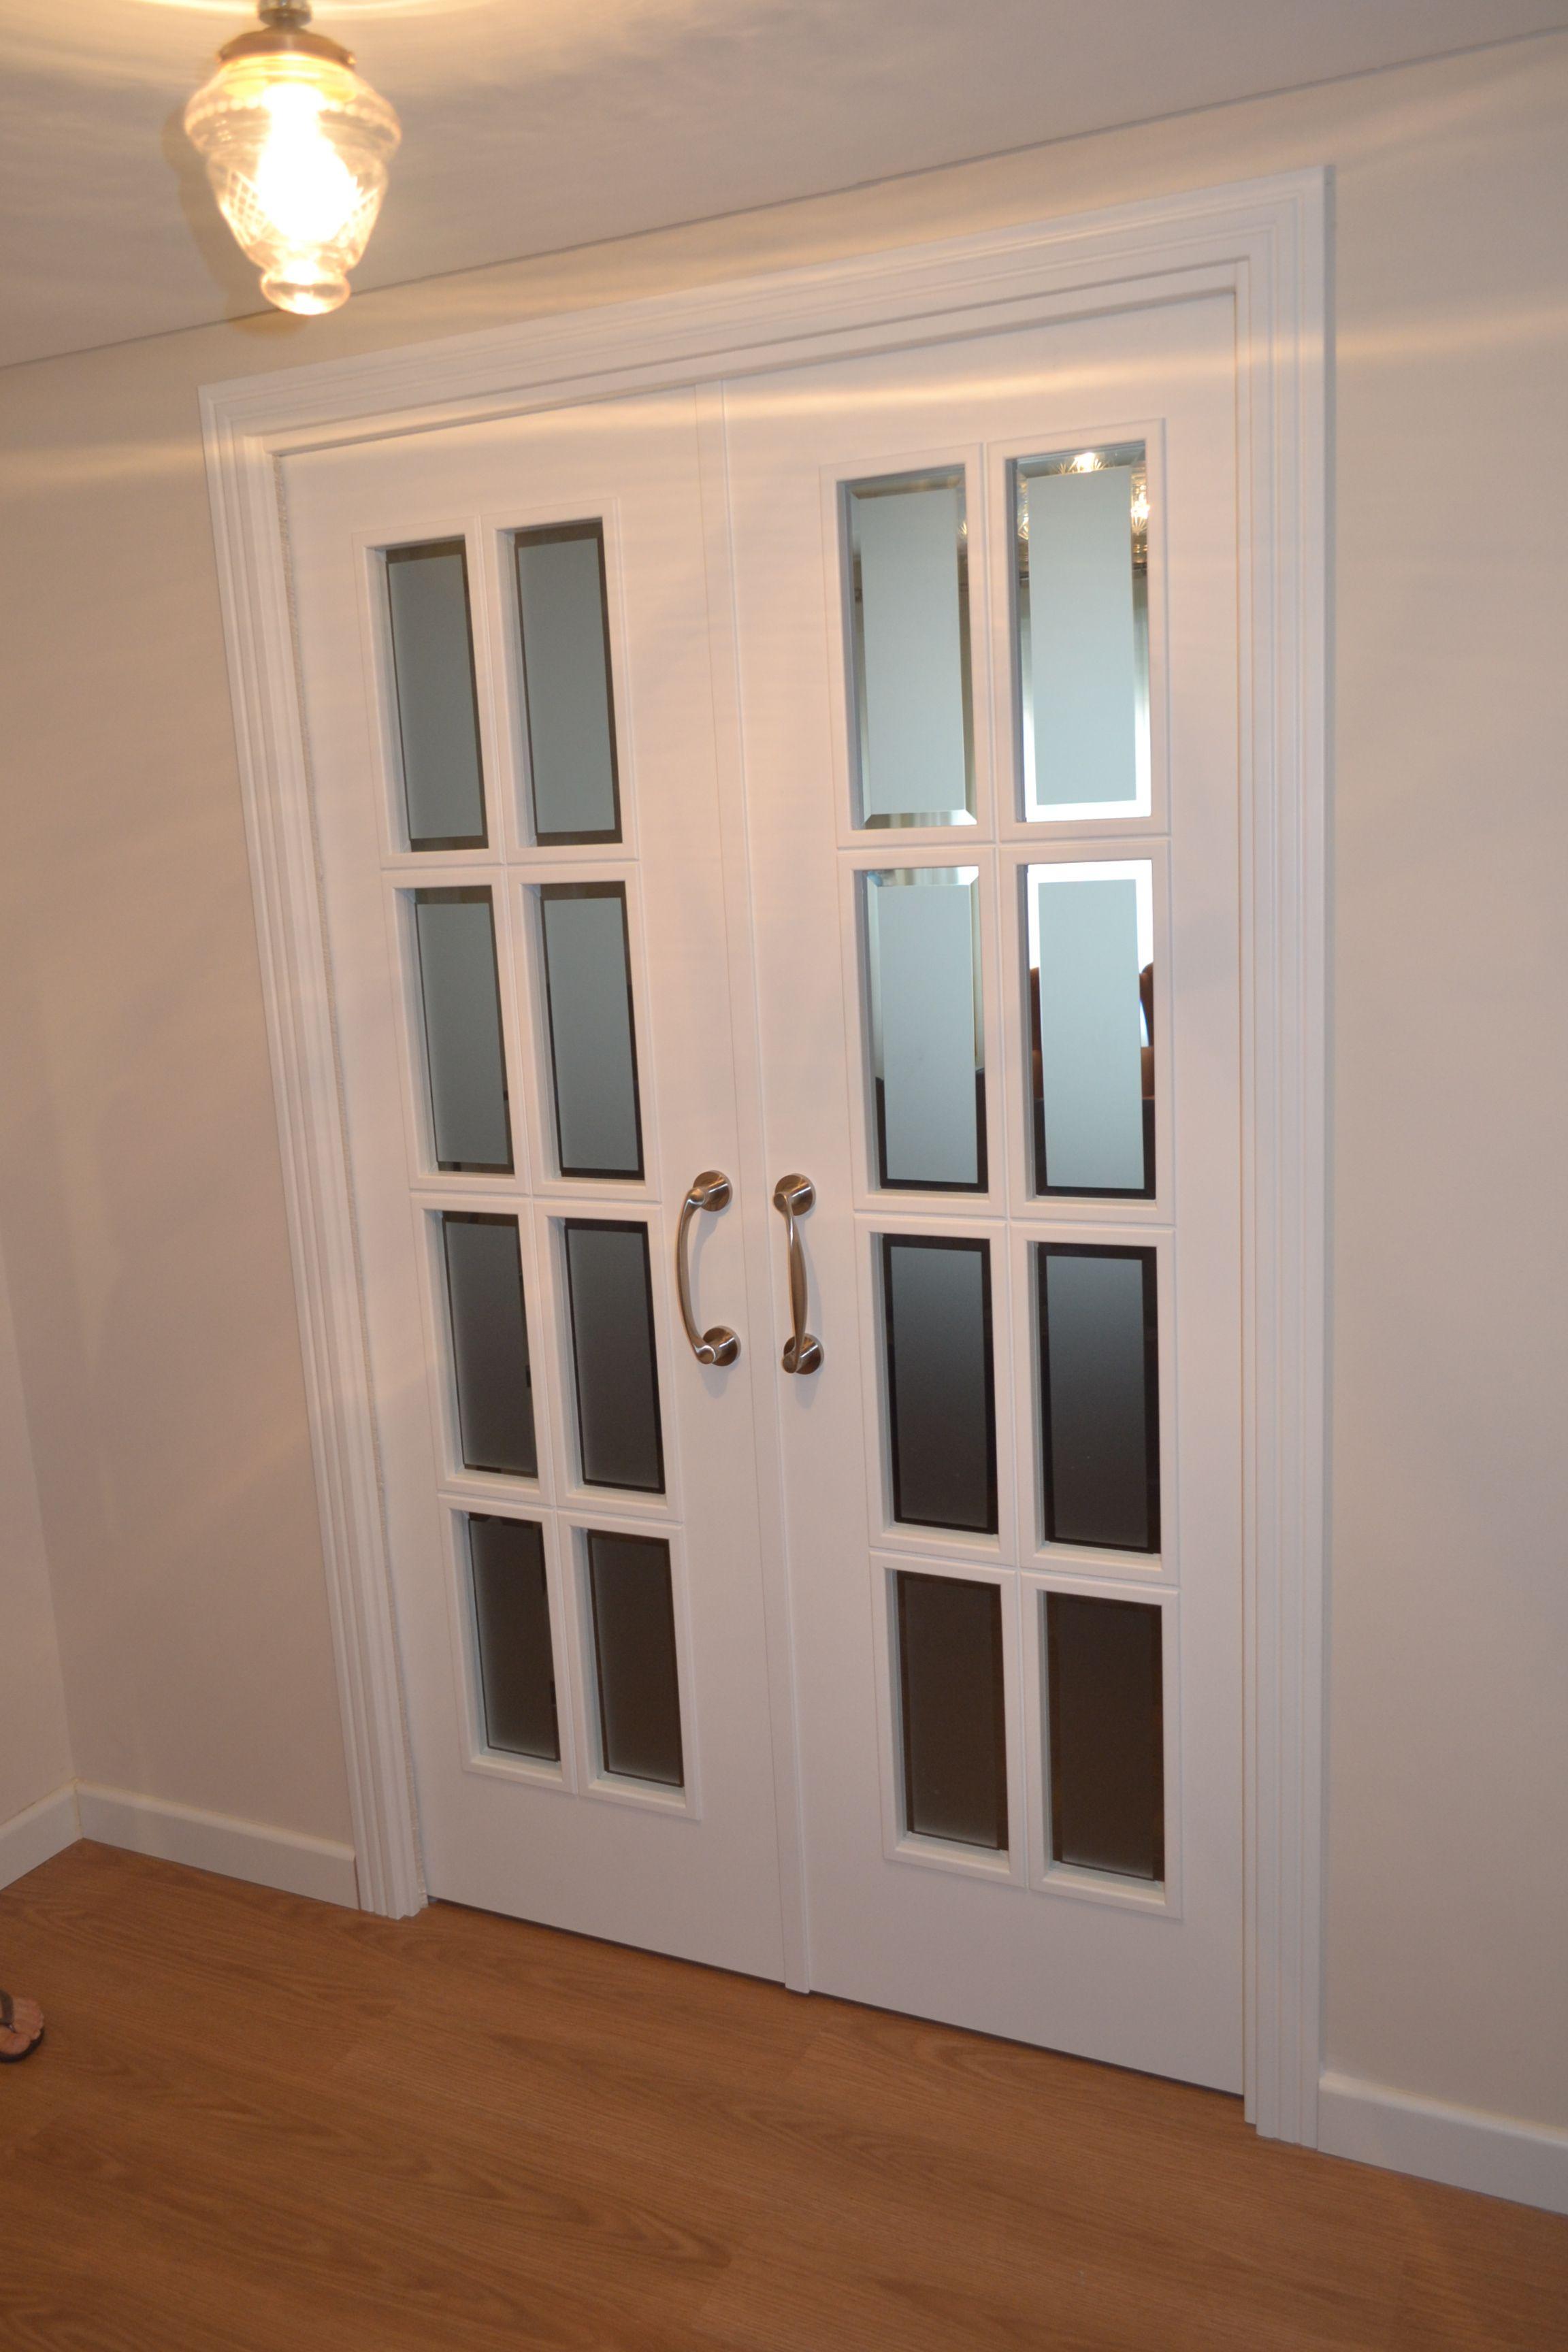 Dise o de puerta interior en sal n de hogar home in 2019 for Colores para pintar puertas de interior